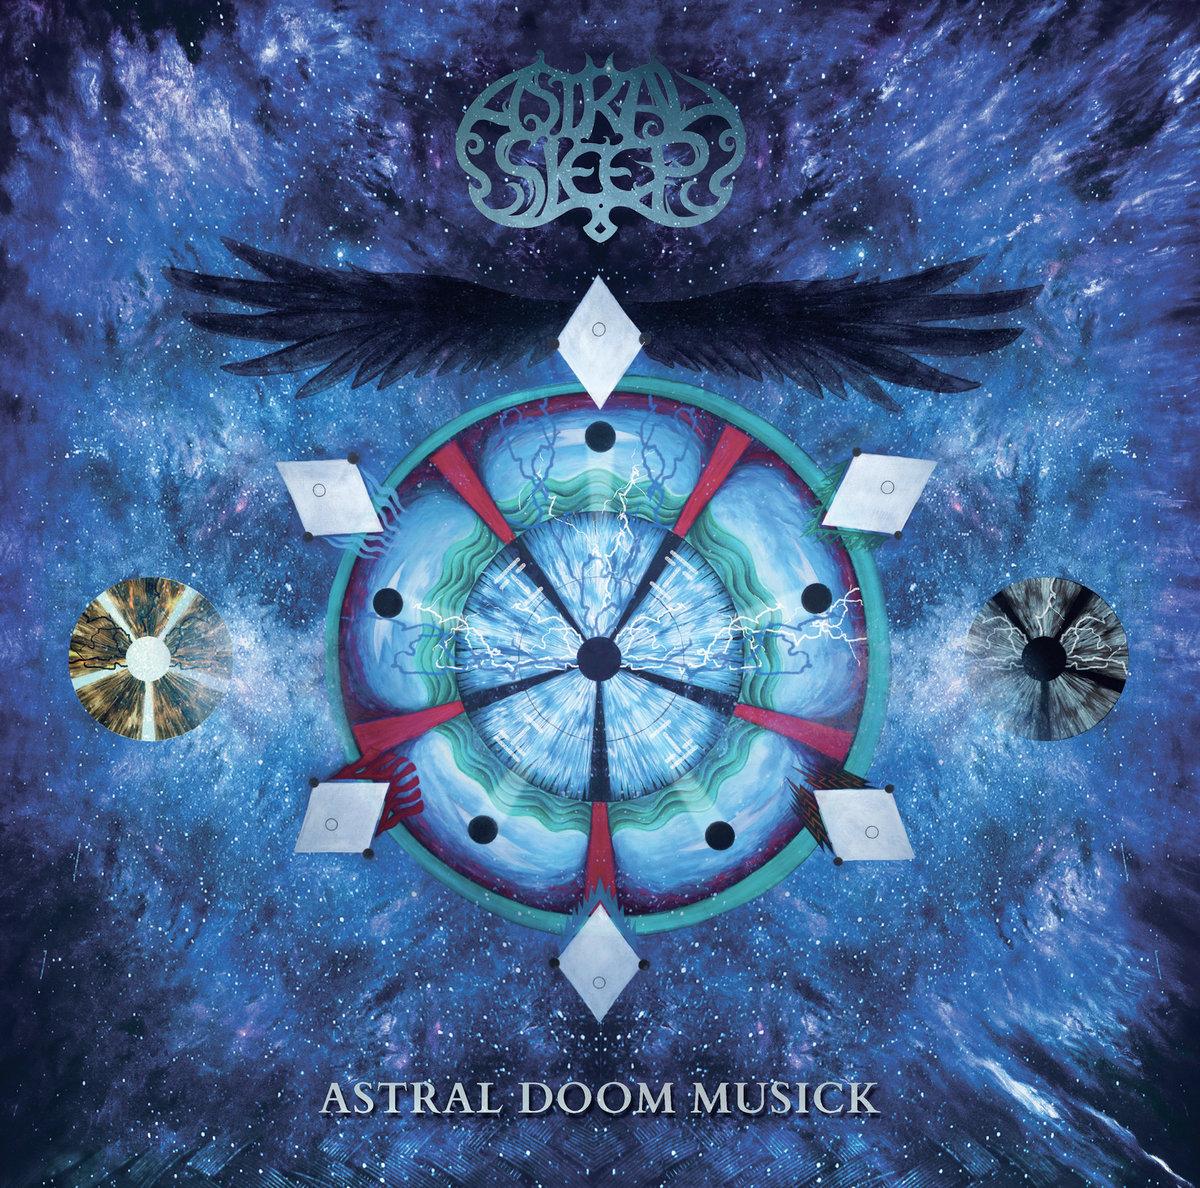 Astral Sleep Astral Doom Musick